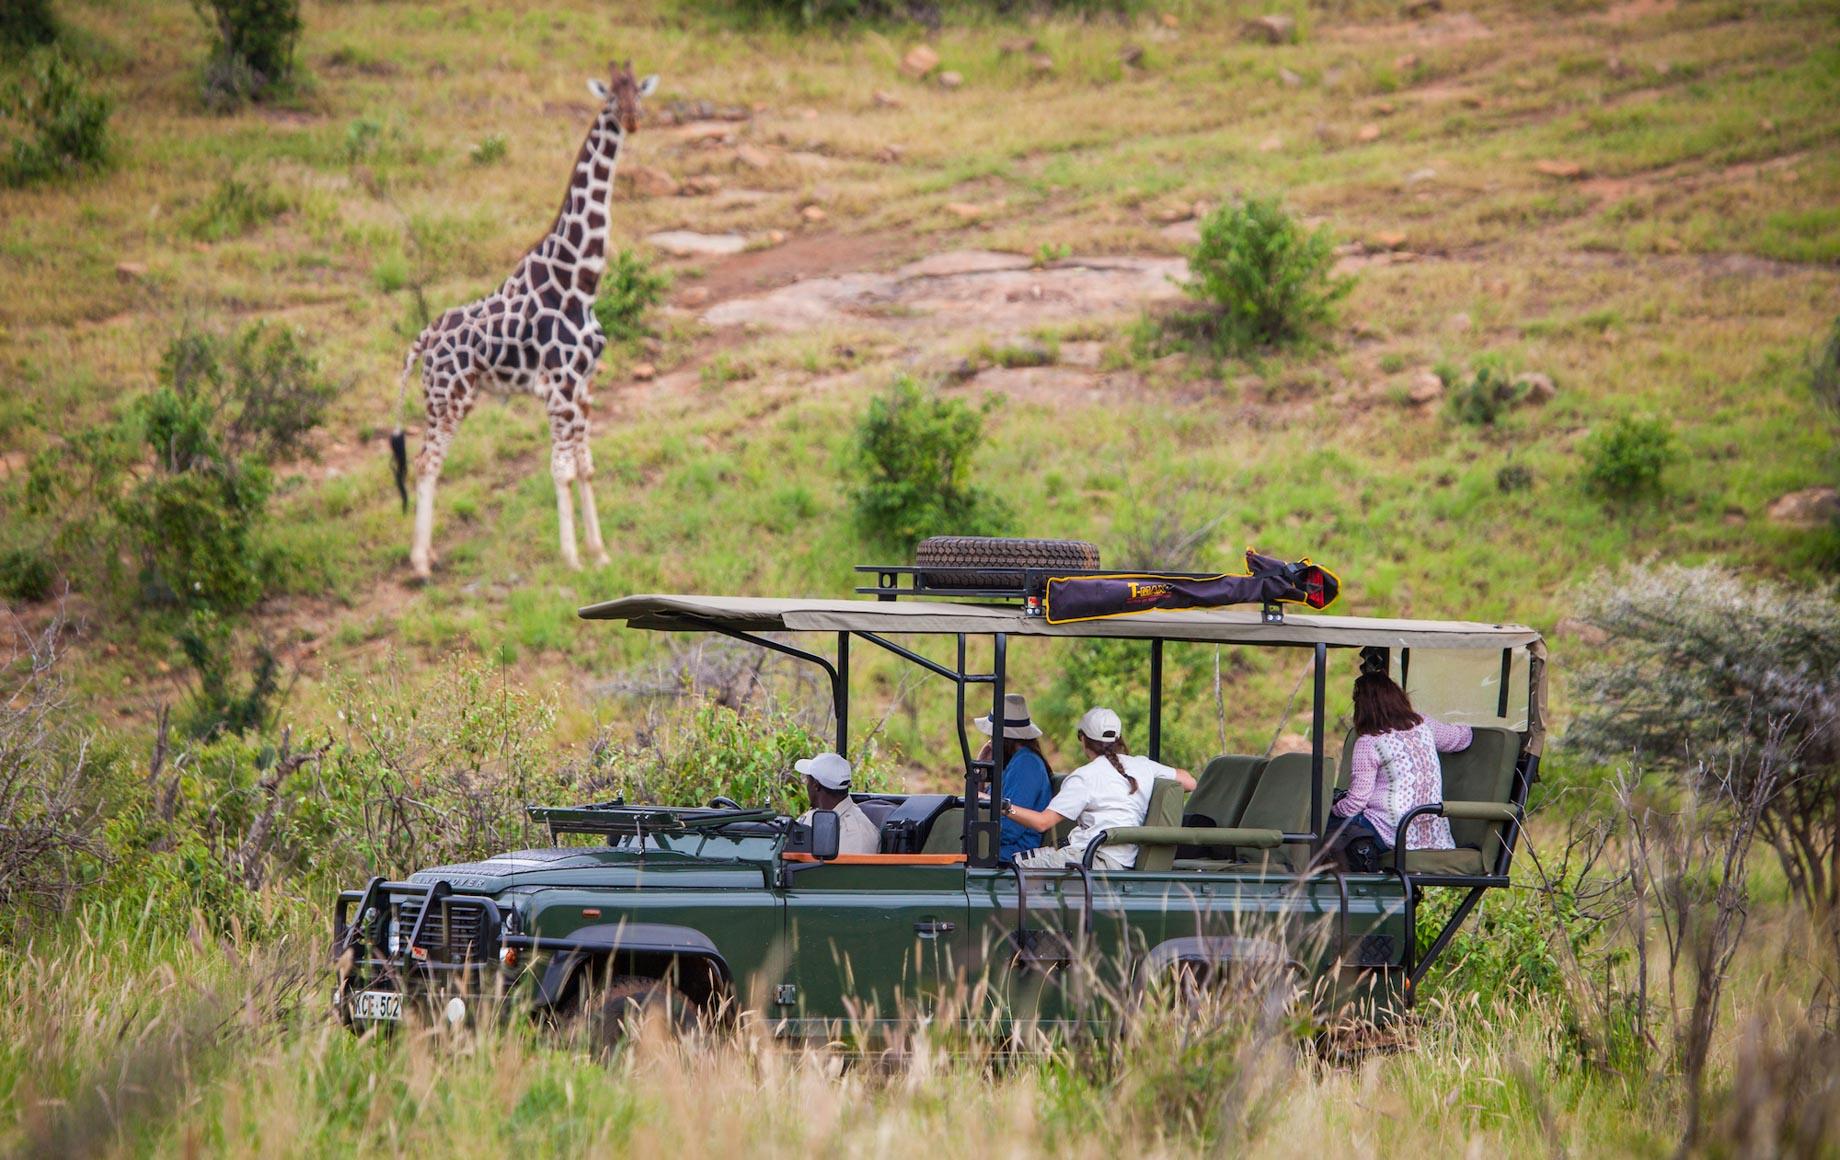 Safariers see giraffe at Loisaba Conservancy